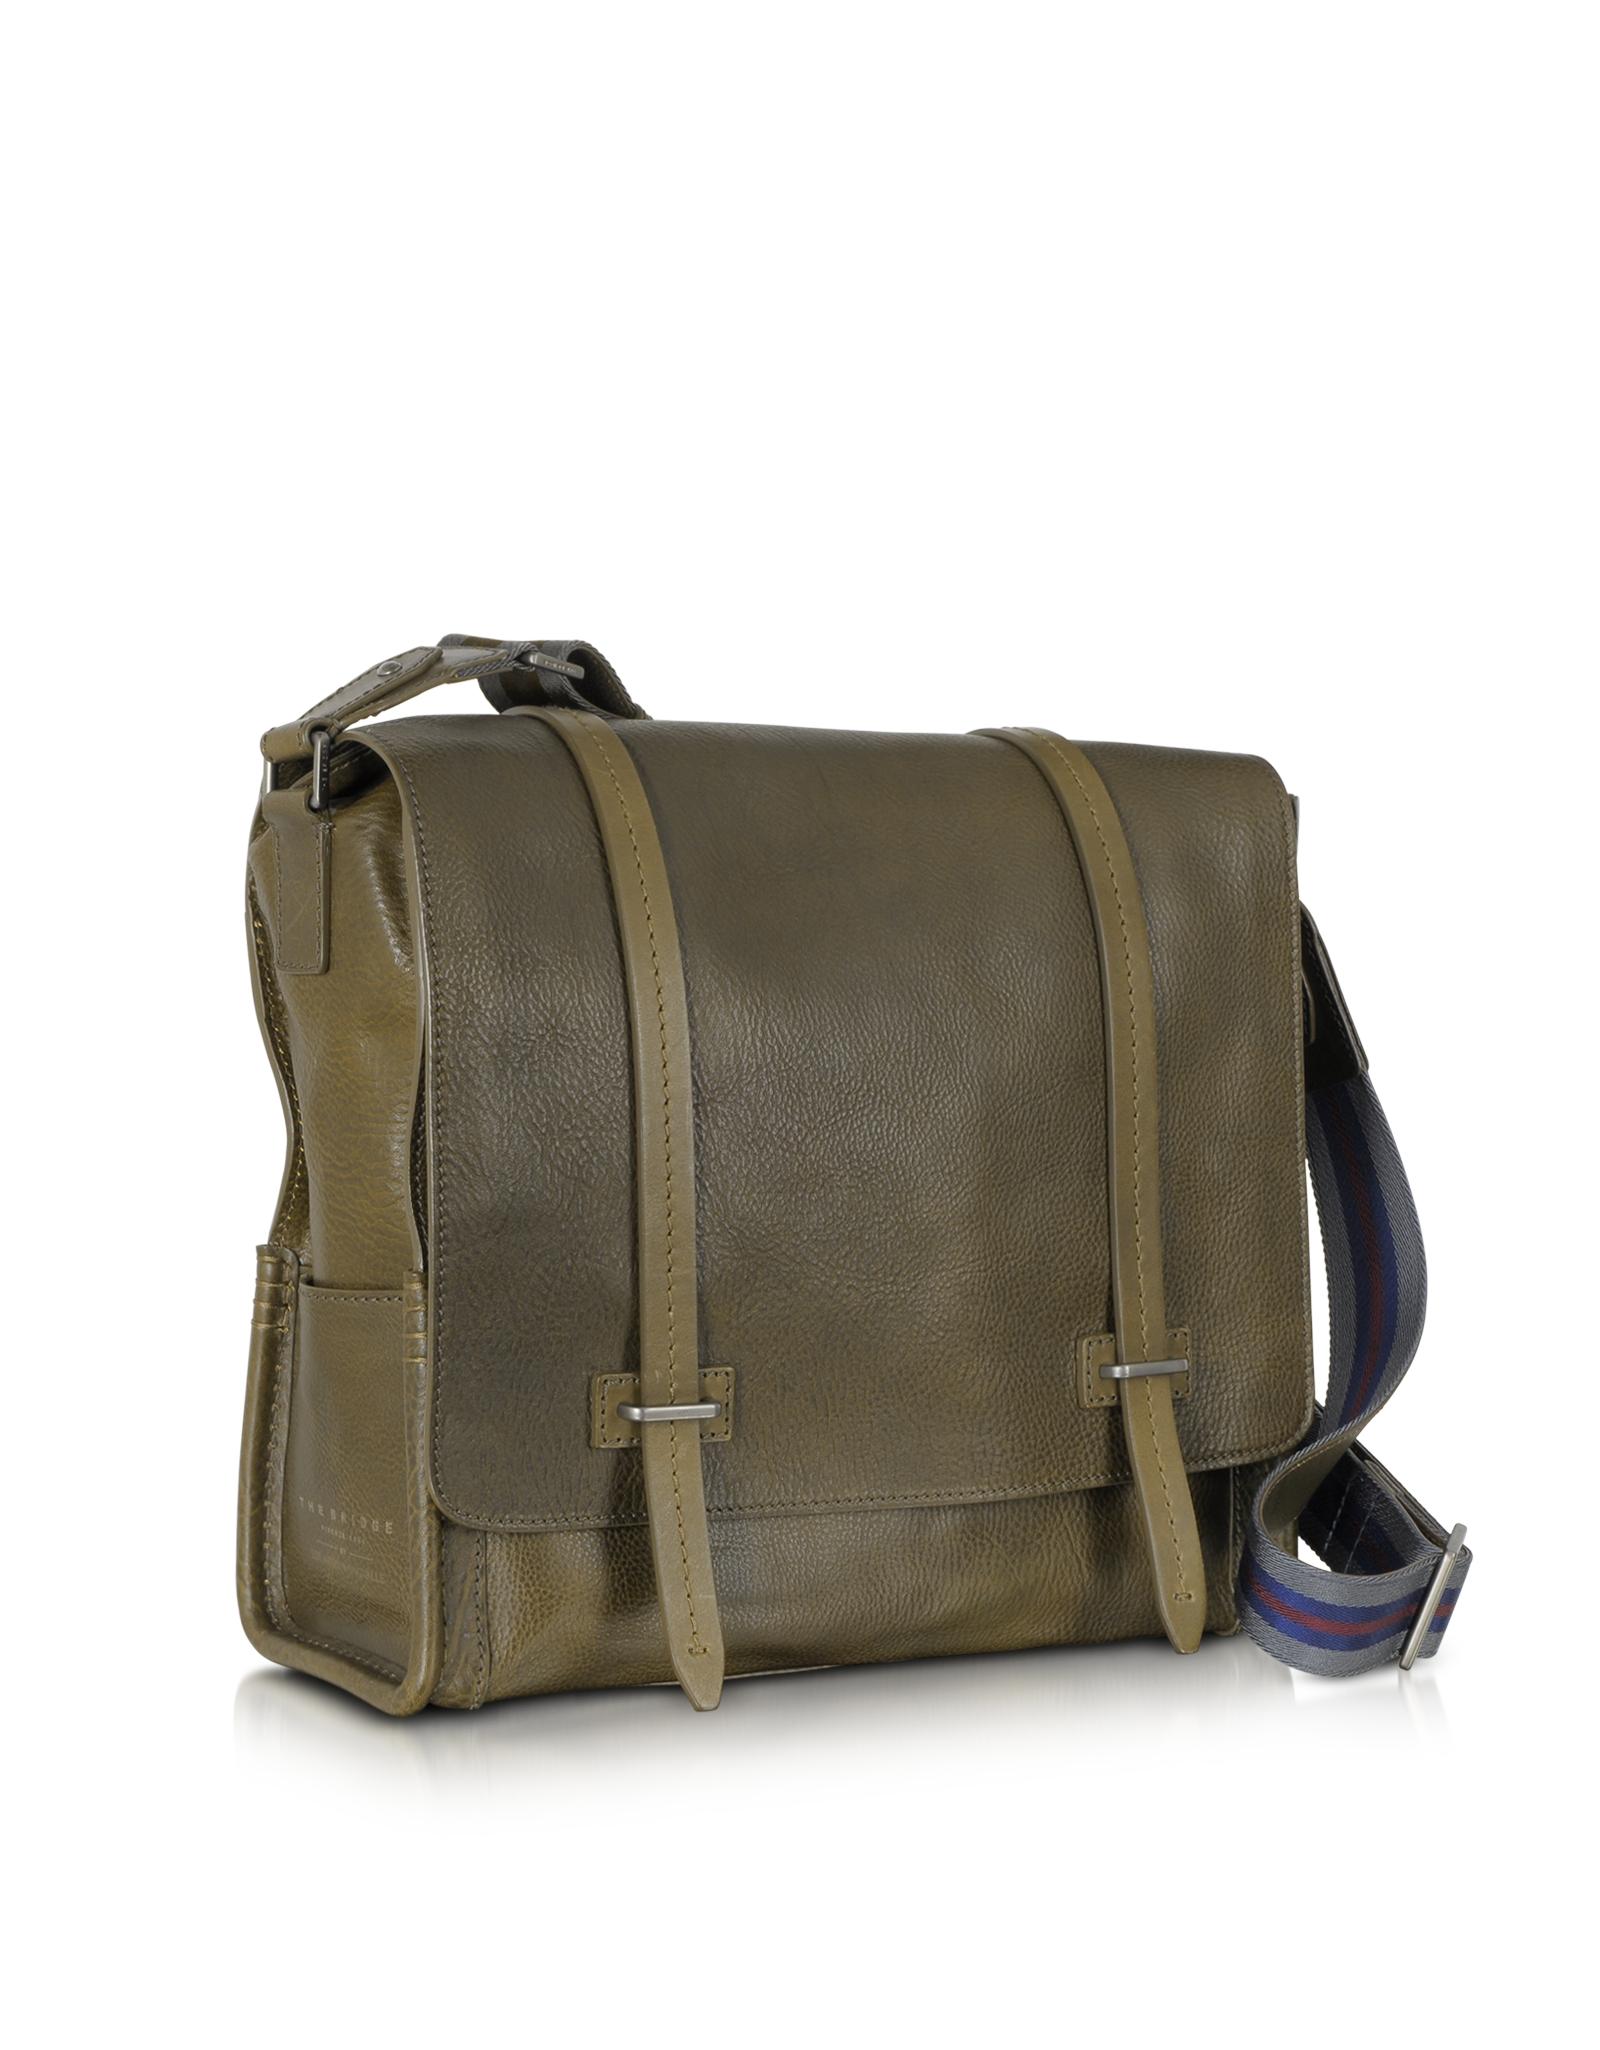 ed35eba5fd8 Lyst - The Bridge Ascott Large Olive Green Leather Messenger Bag in ...